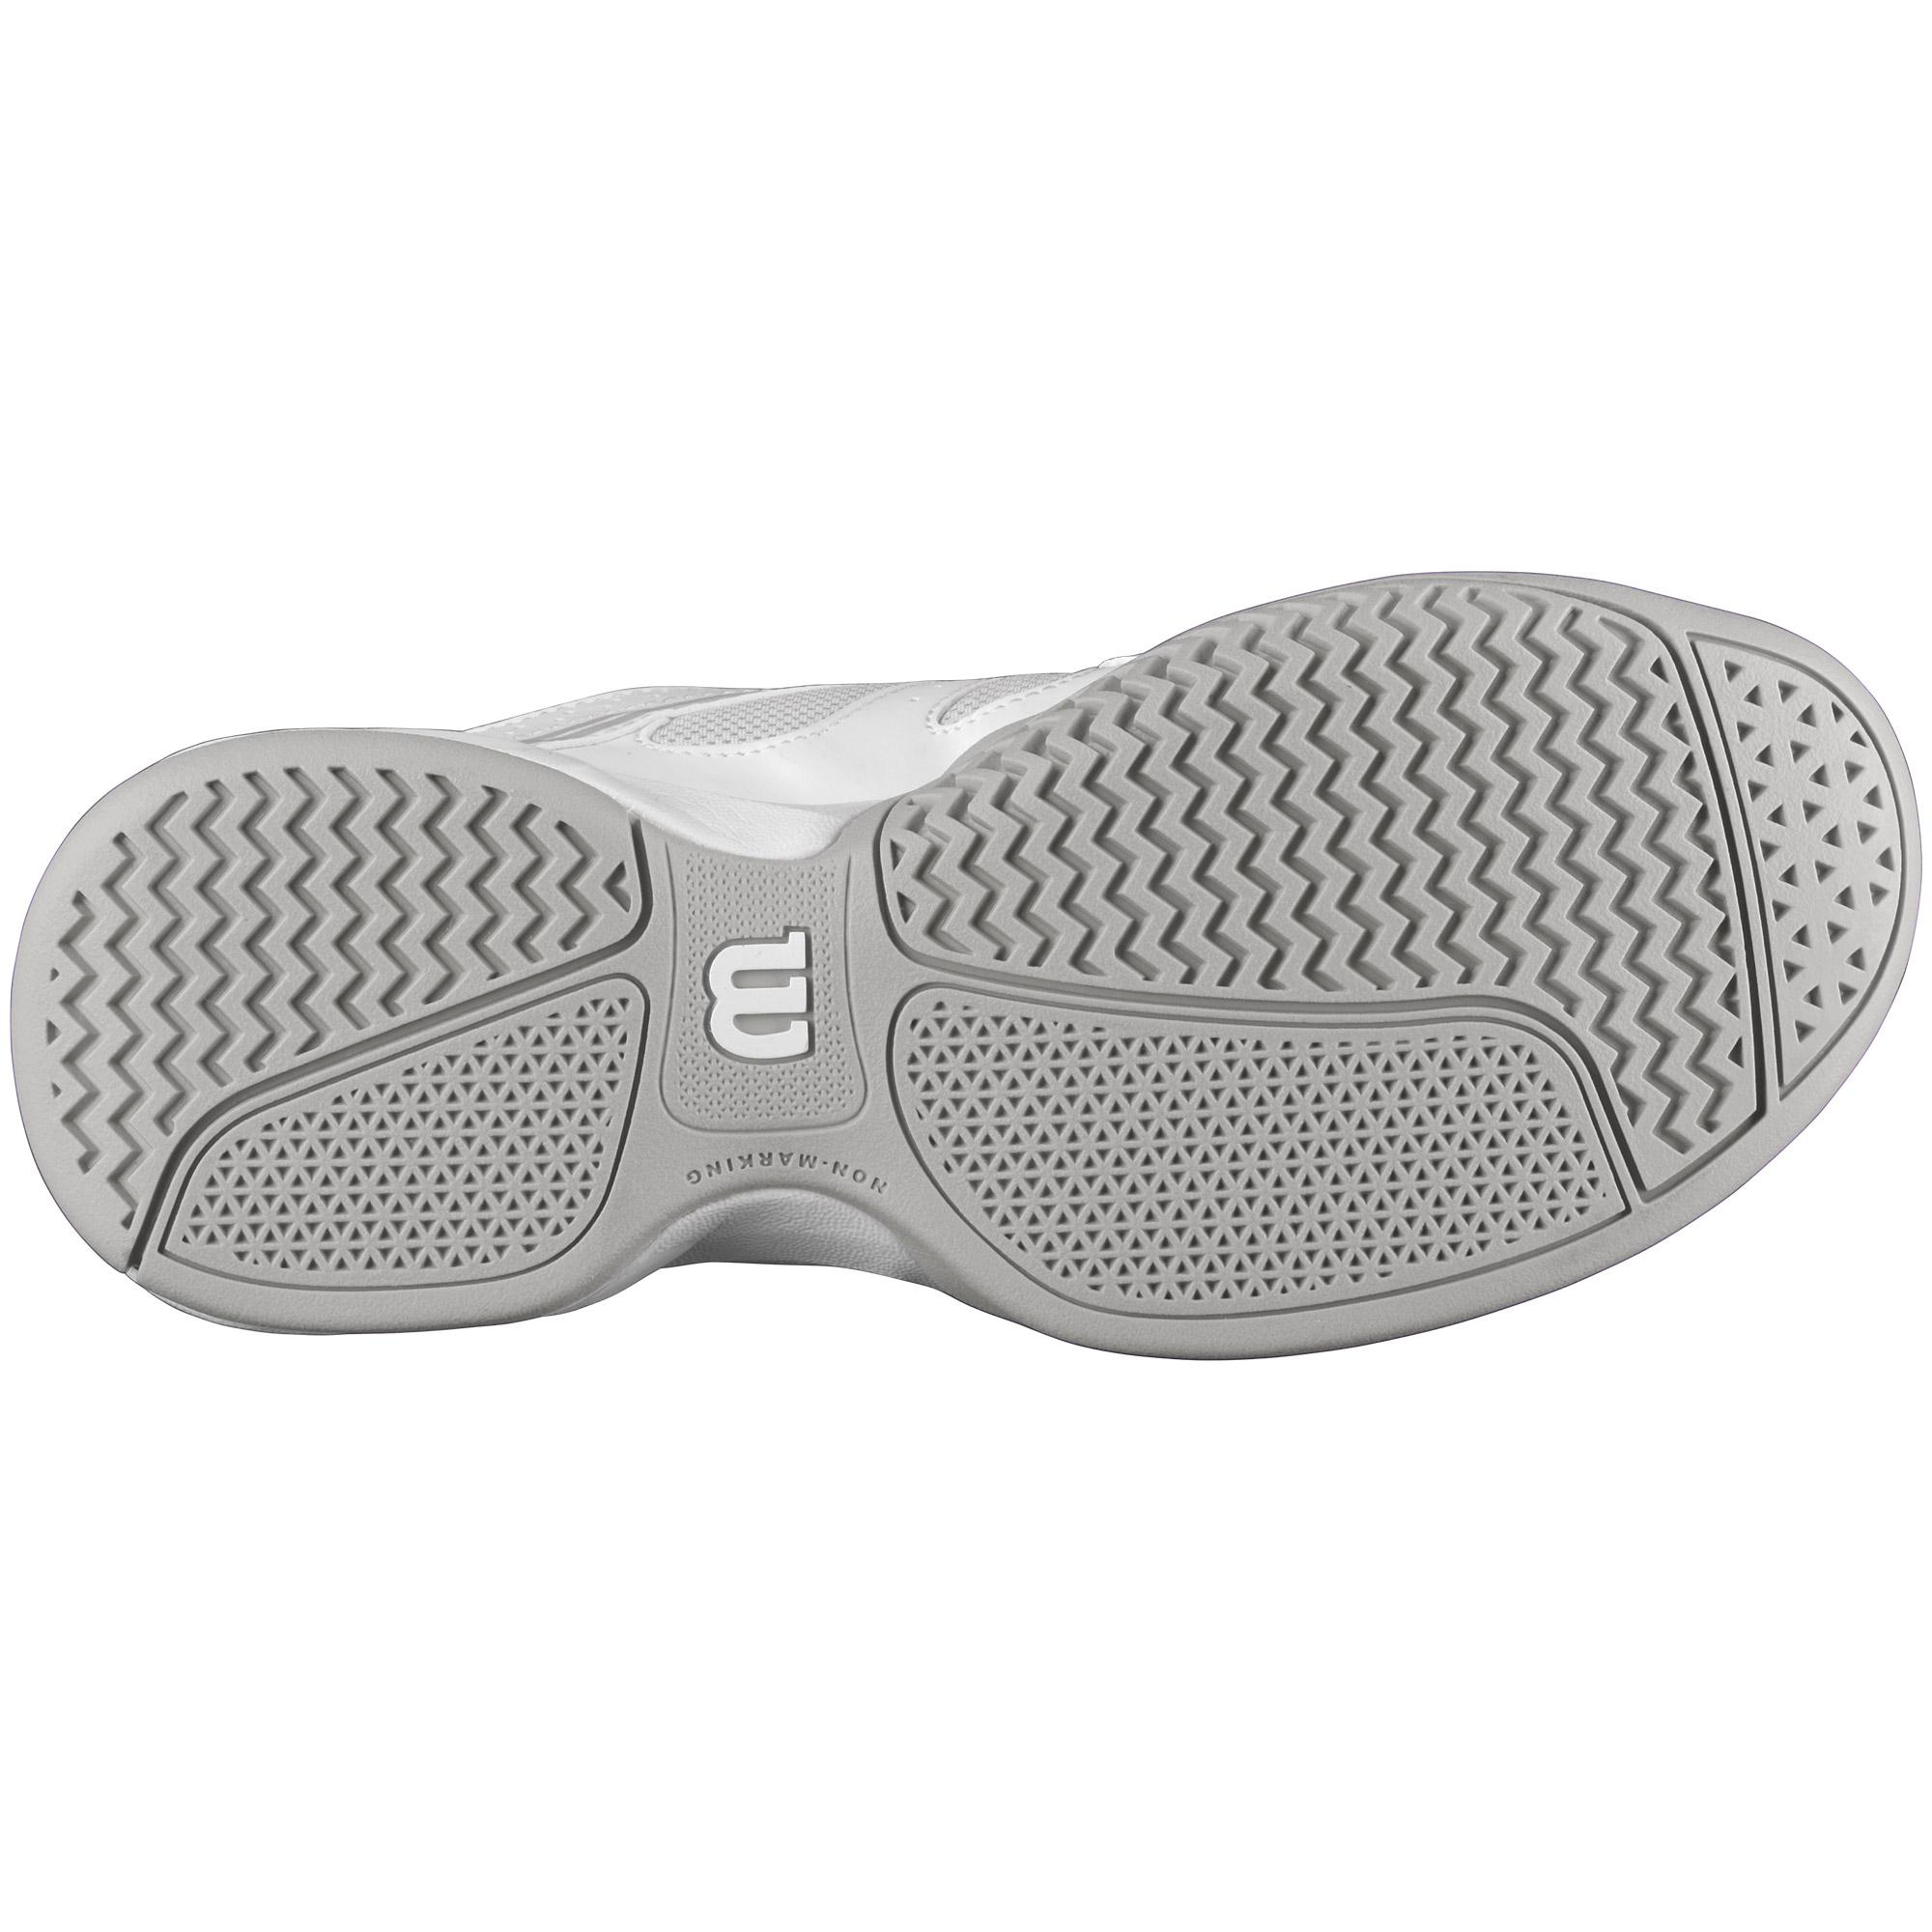 Tennis Shoe Wilson All Court Sole